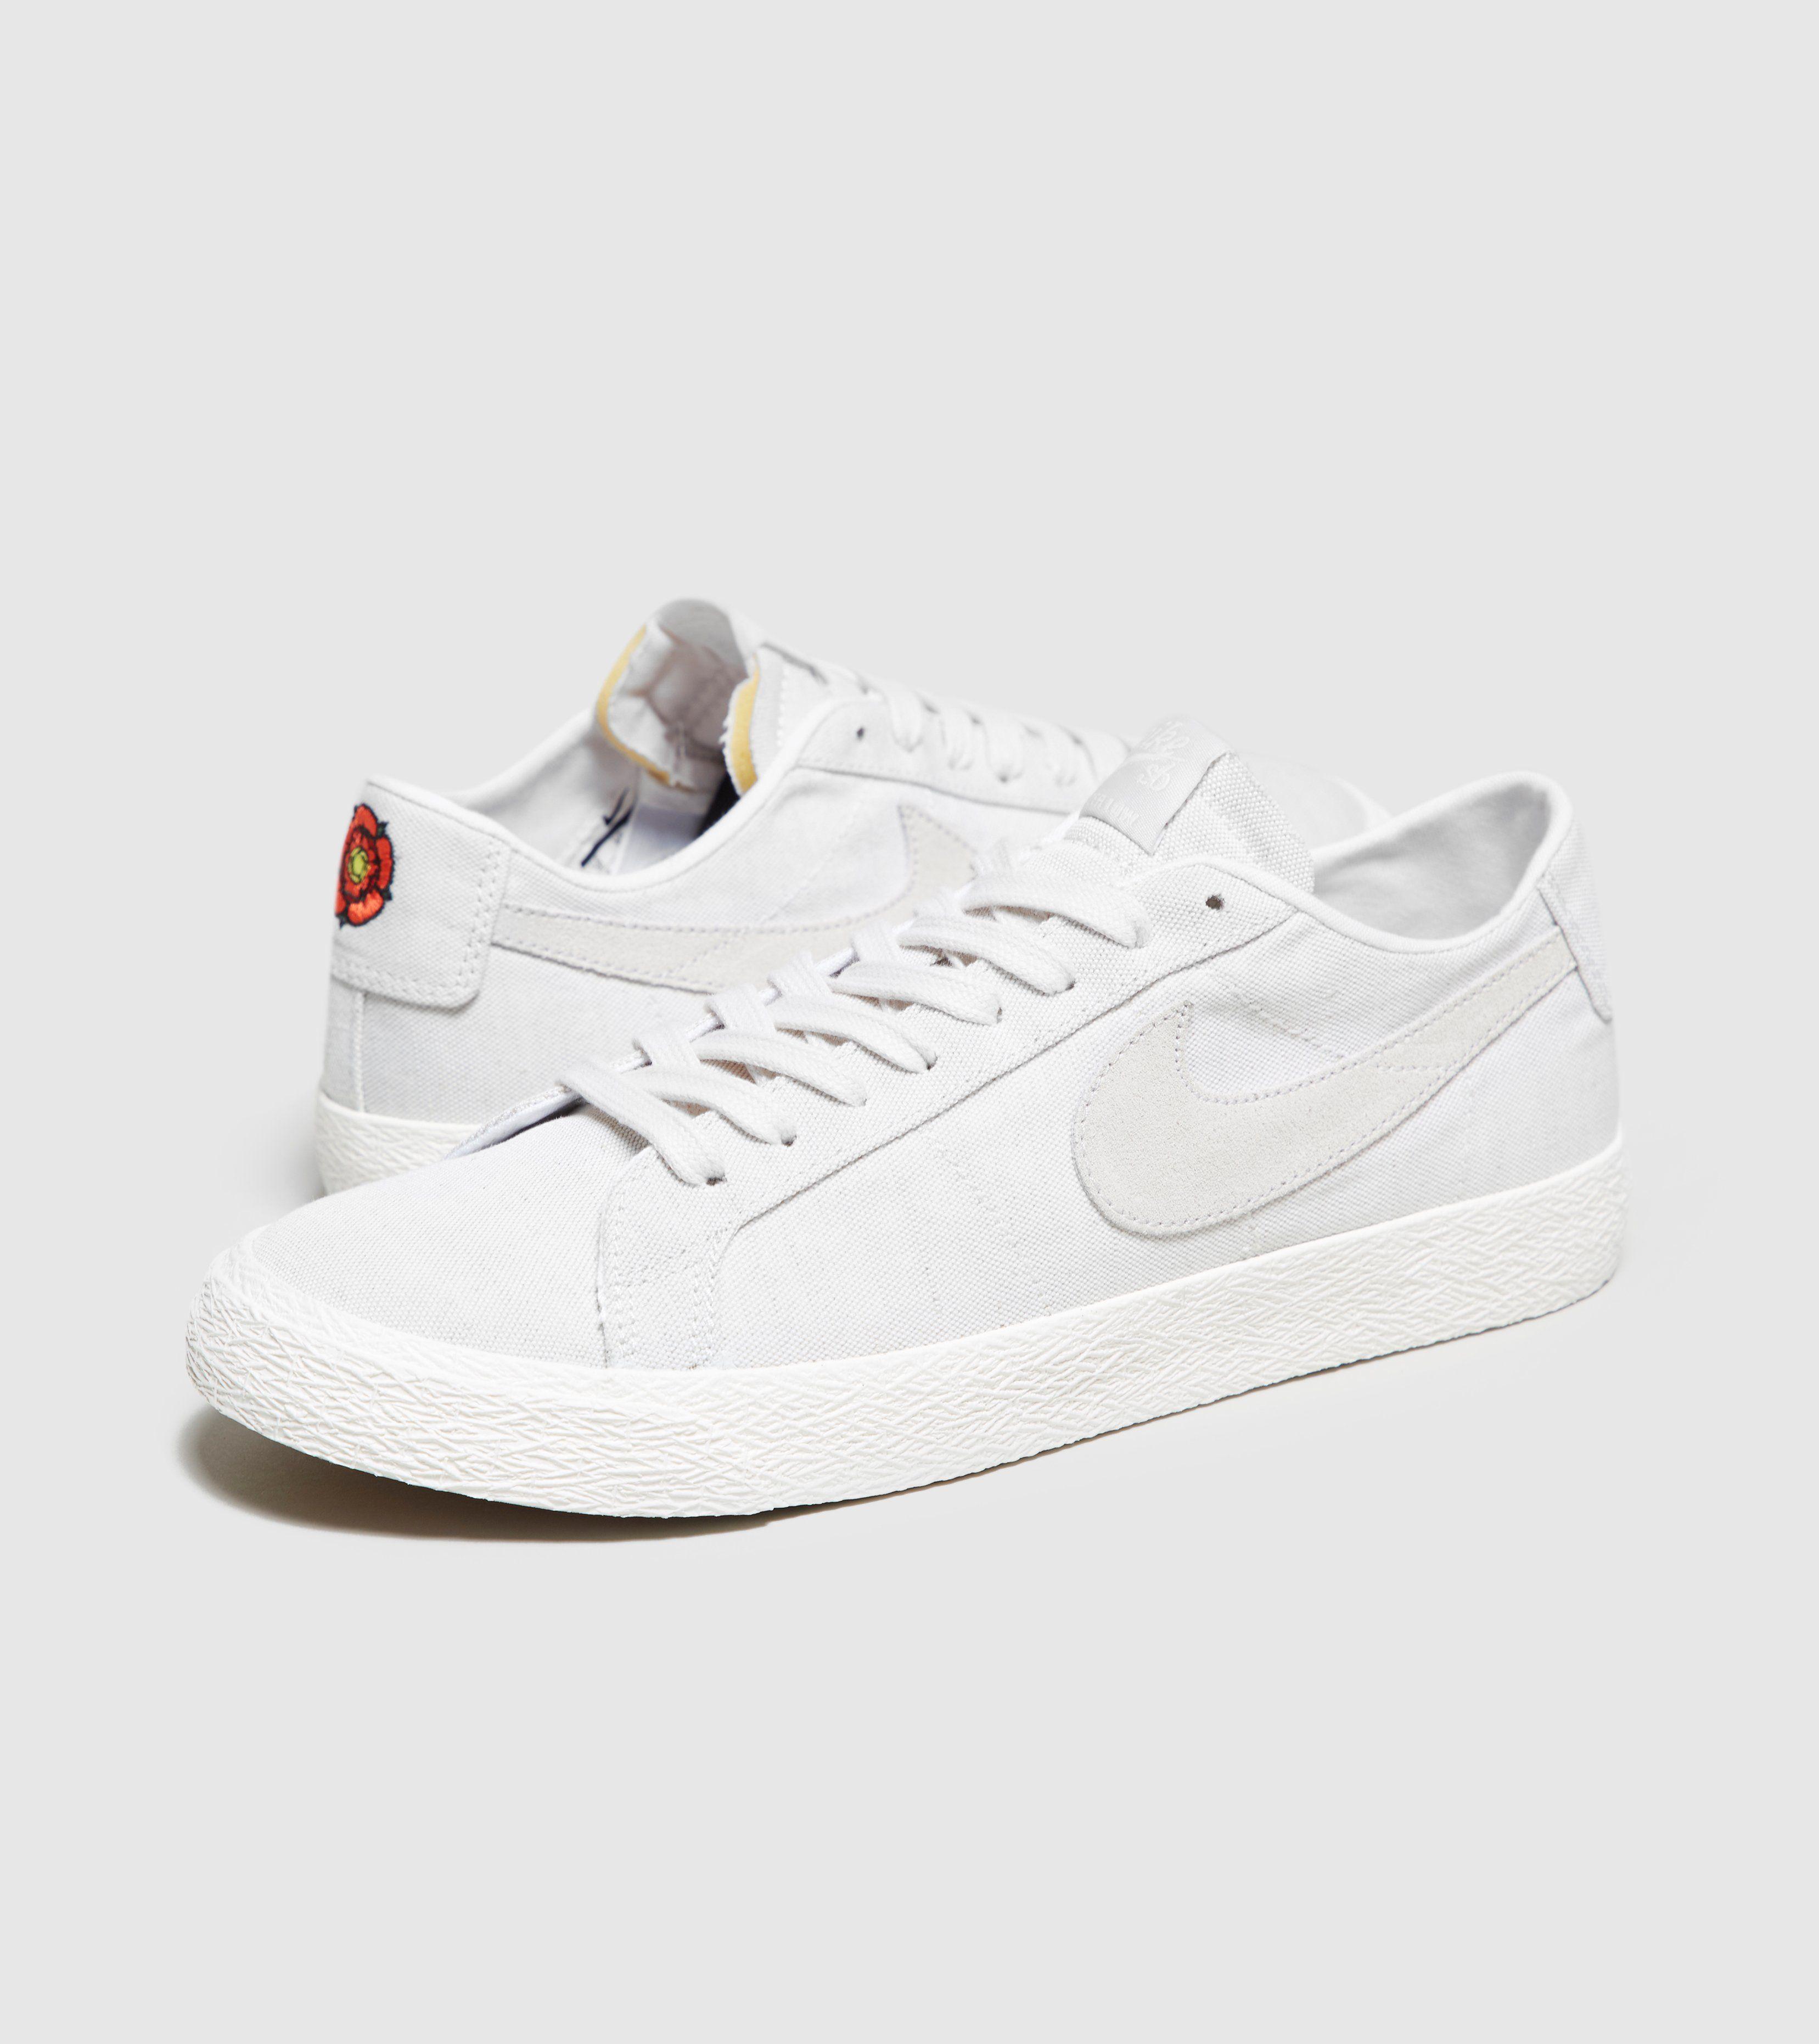 Nike SB x Lance Mountain Blazer Lo